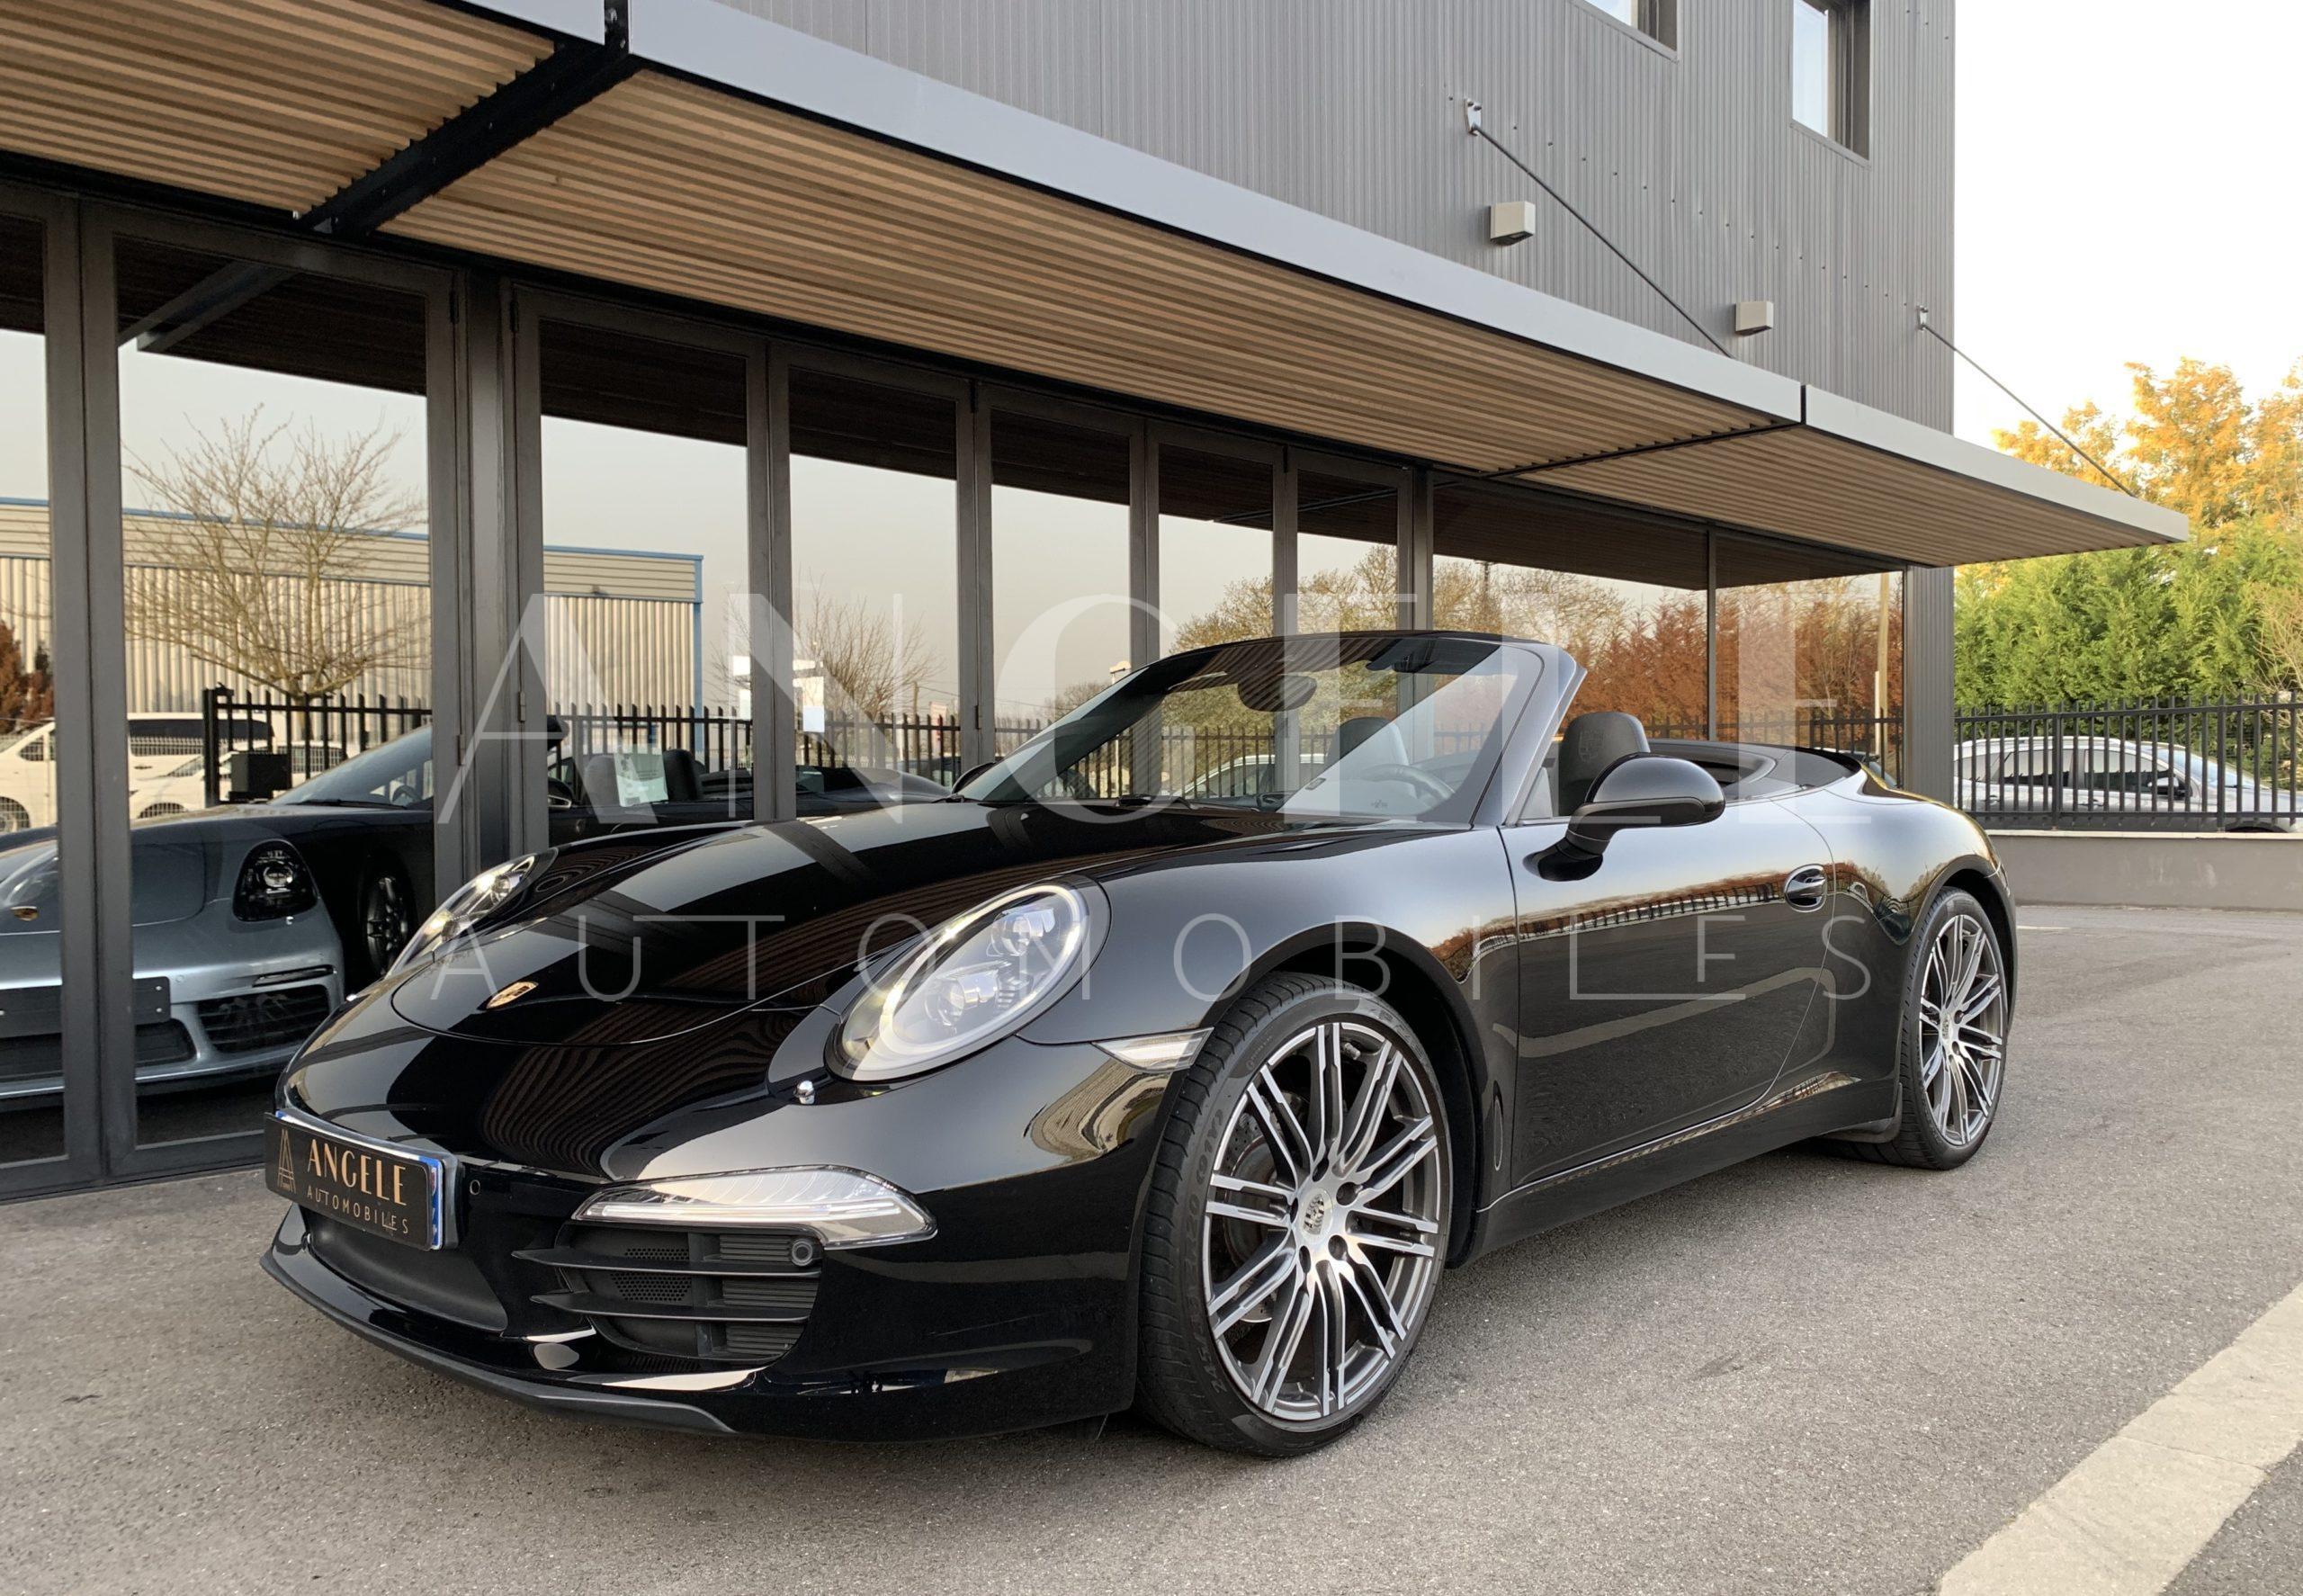 PORSCHE 911 CABRIOLET BLACK EDITION - Angelé Automobiles